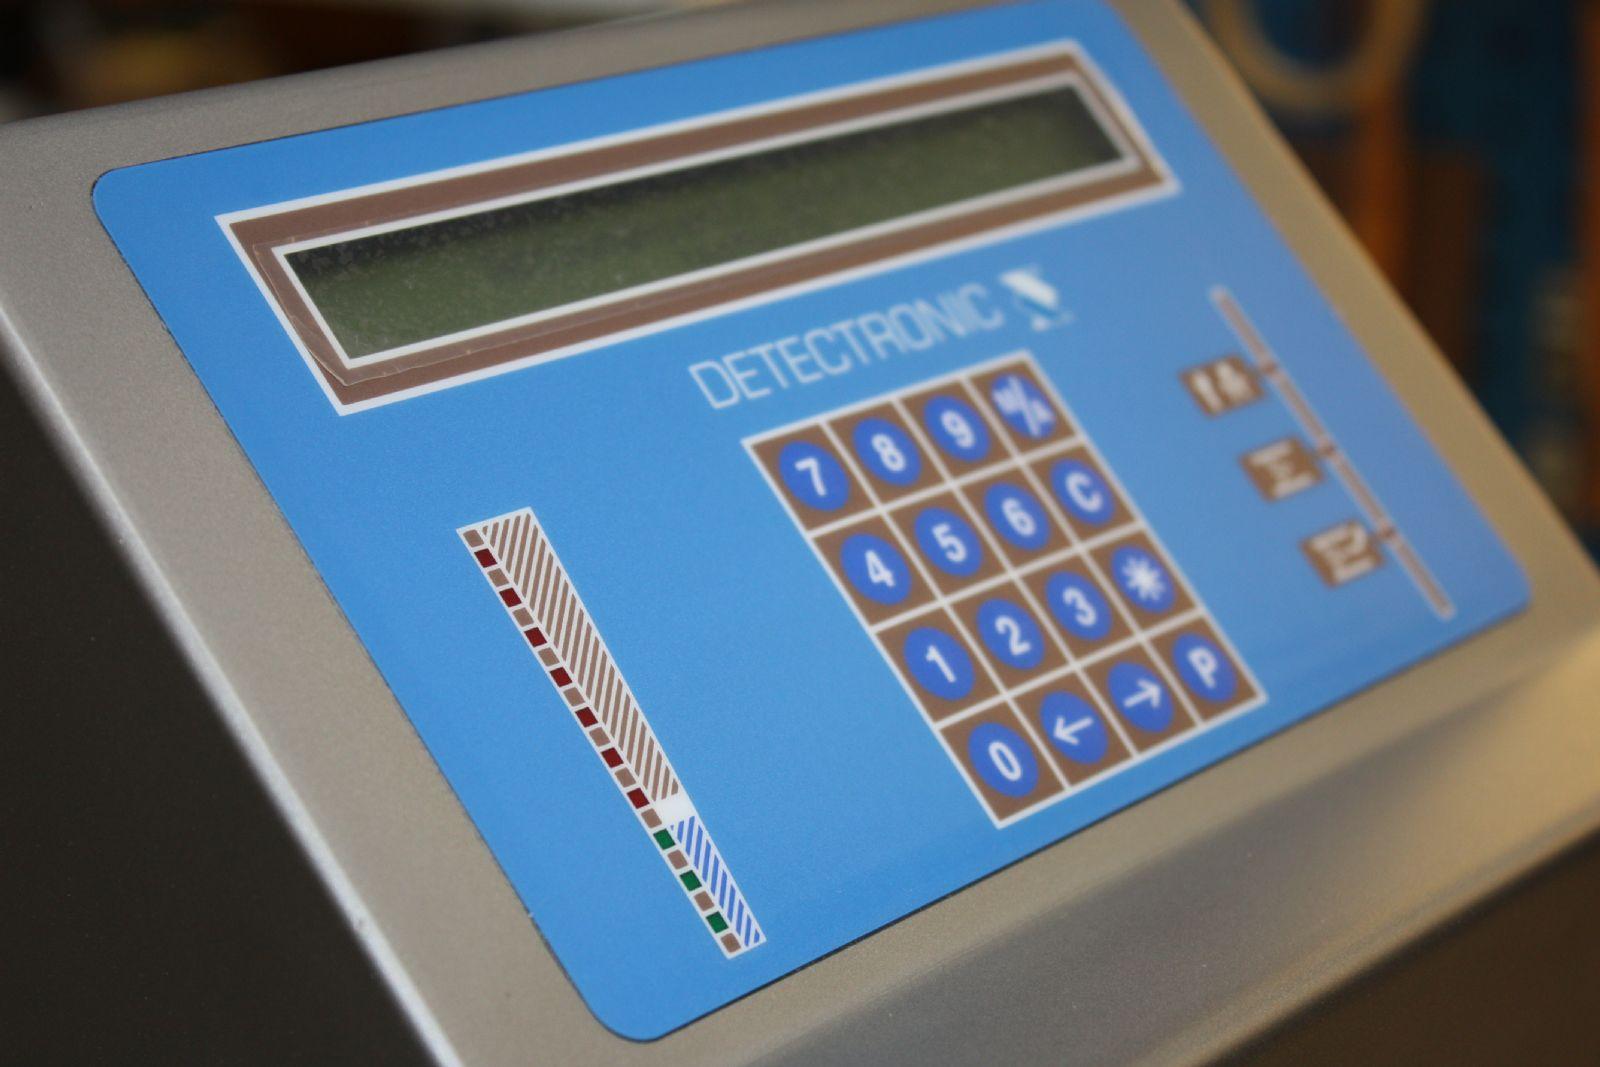 Detectronic-web-5